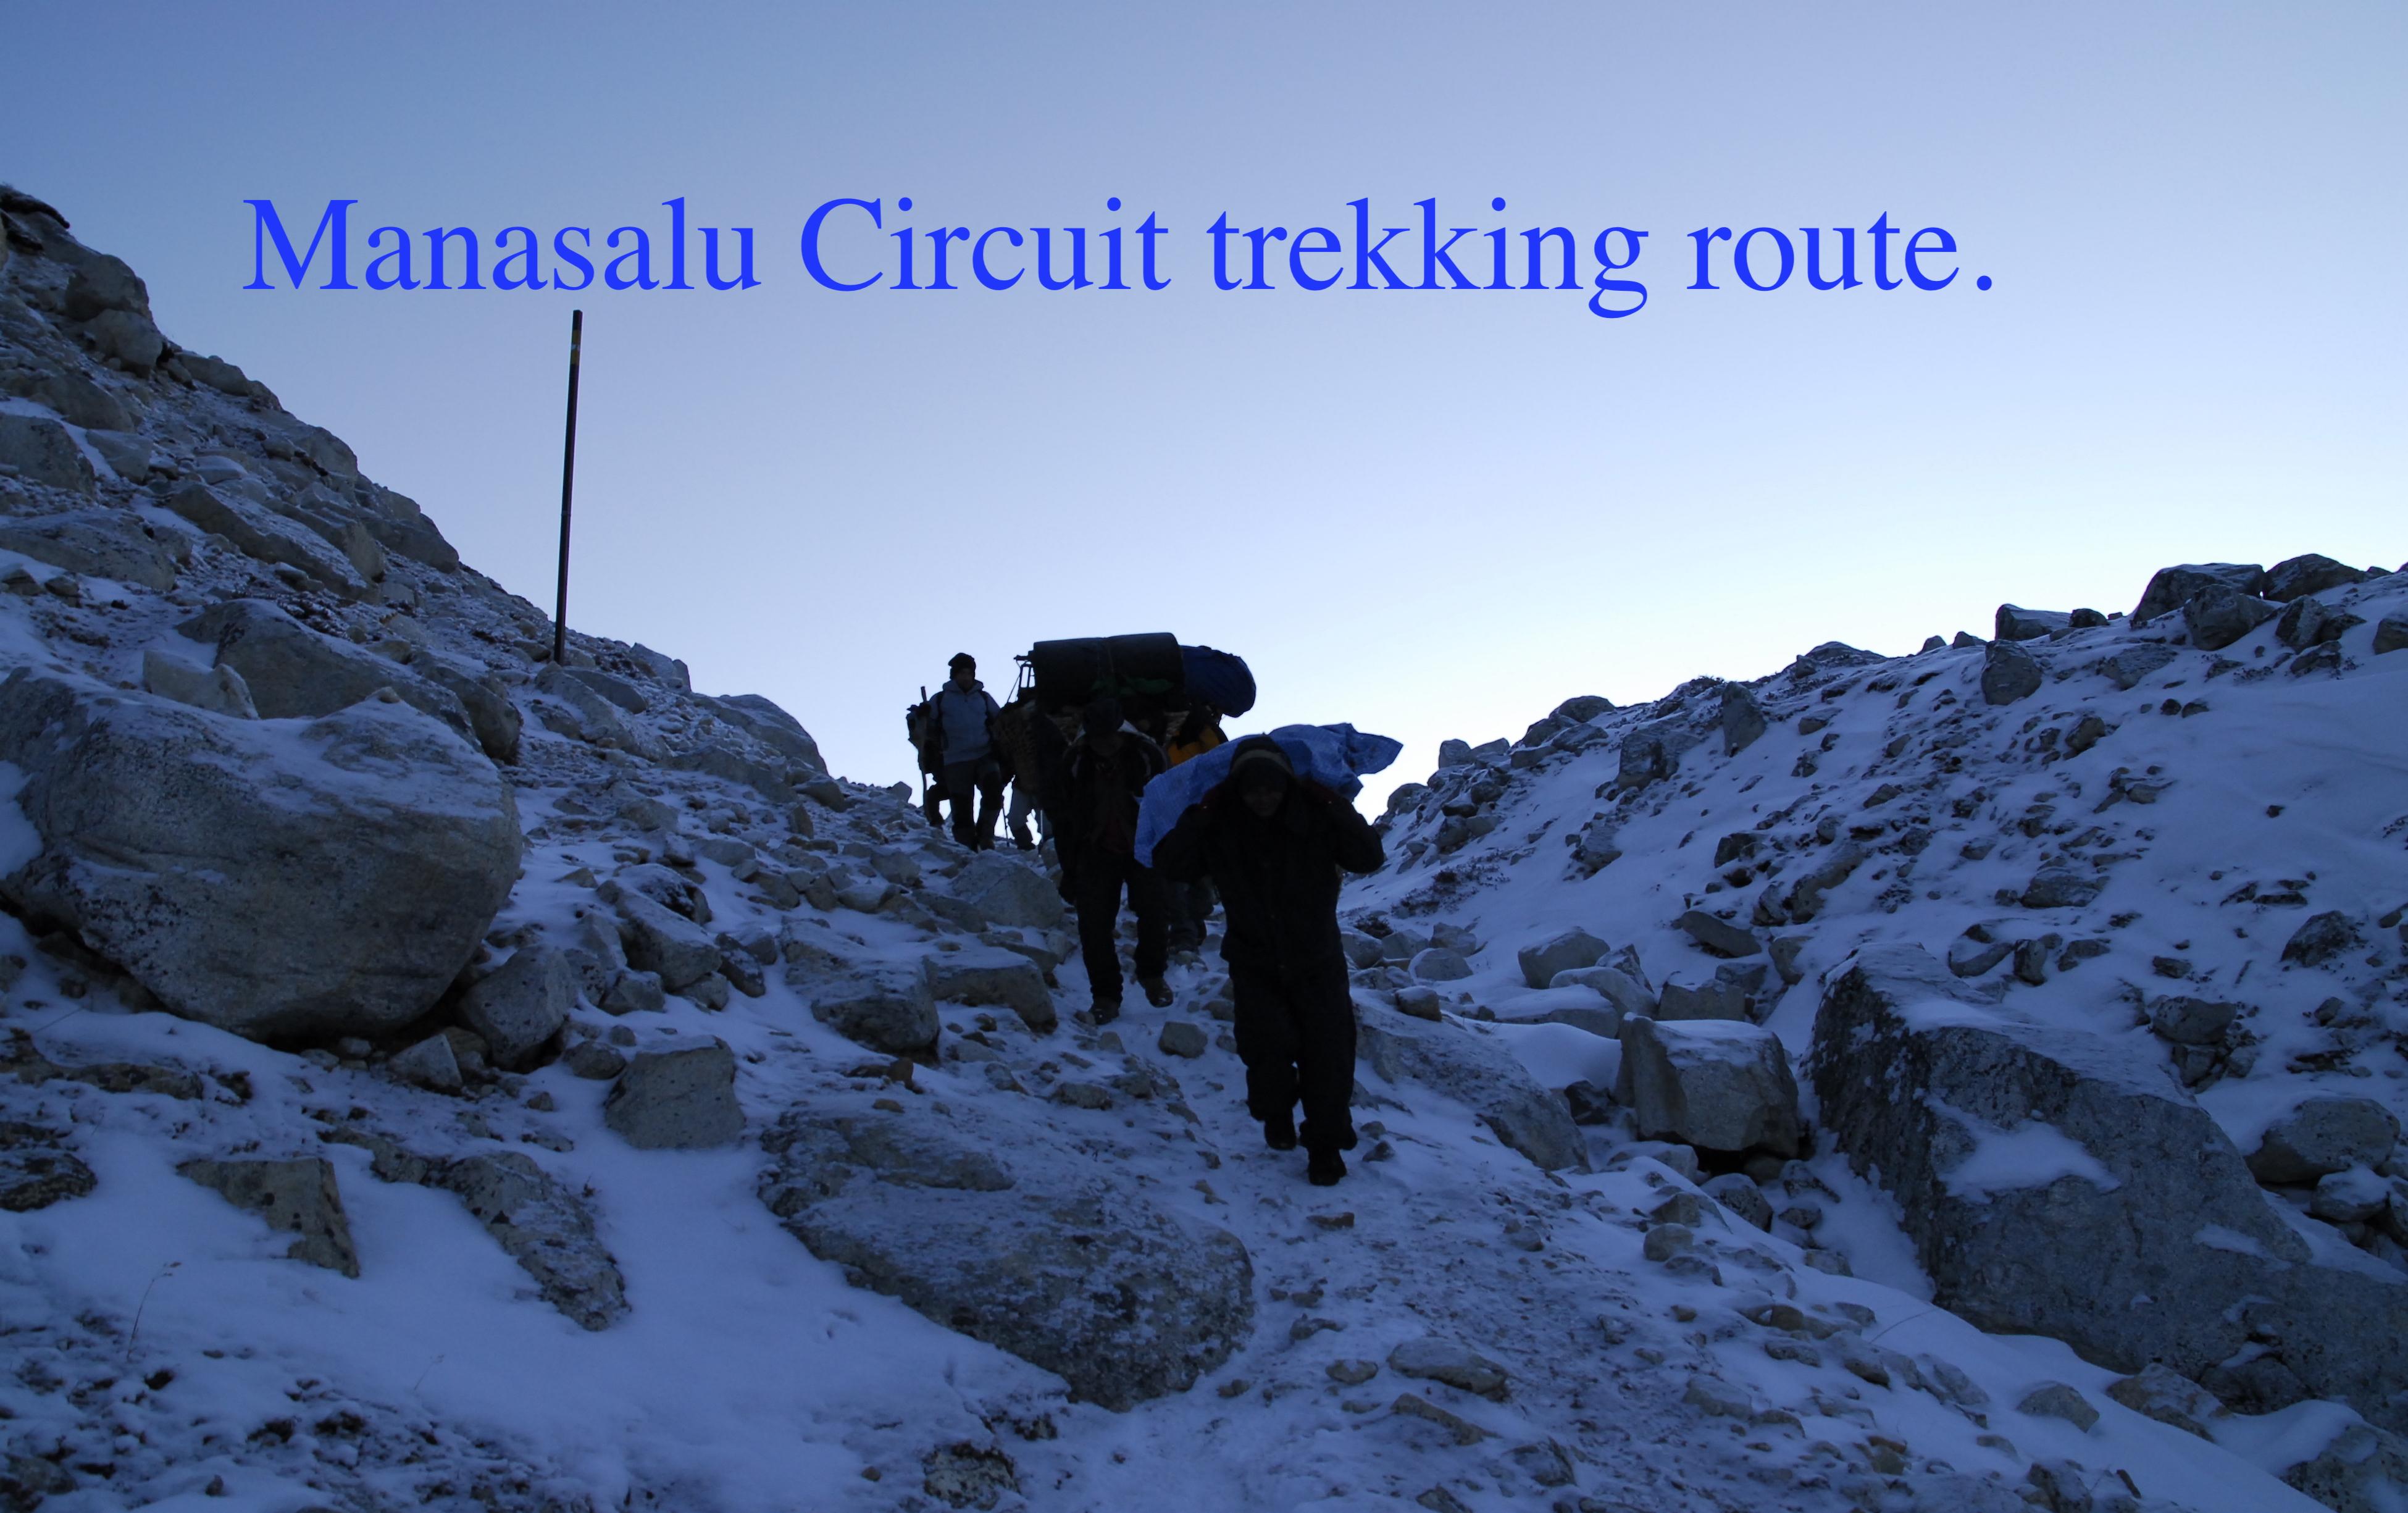 Manasalu Circuit trekking route